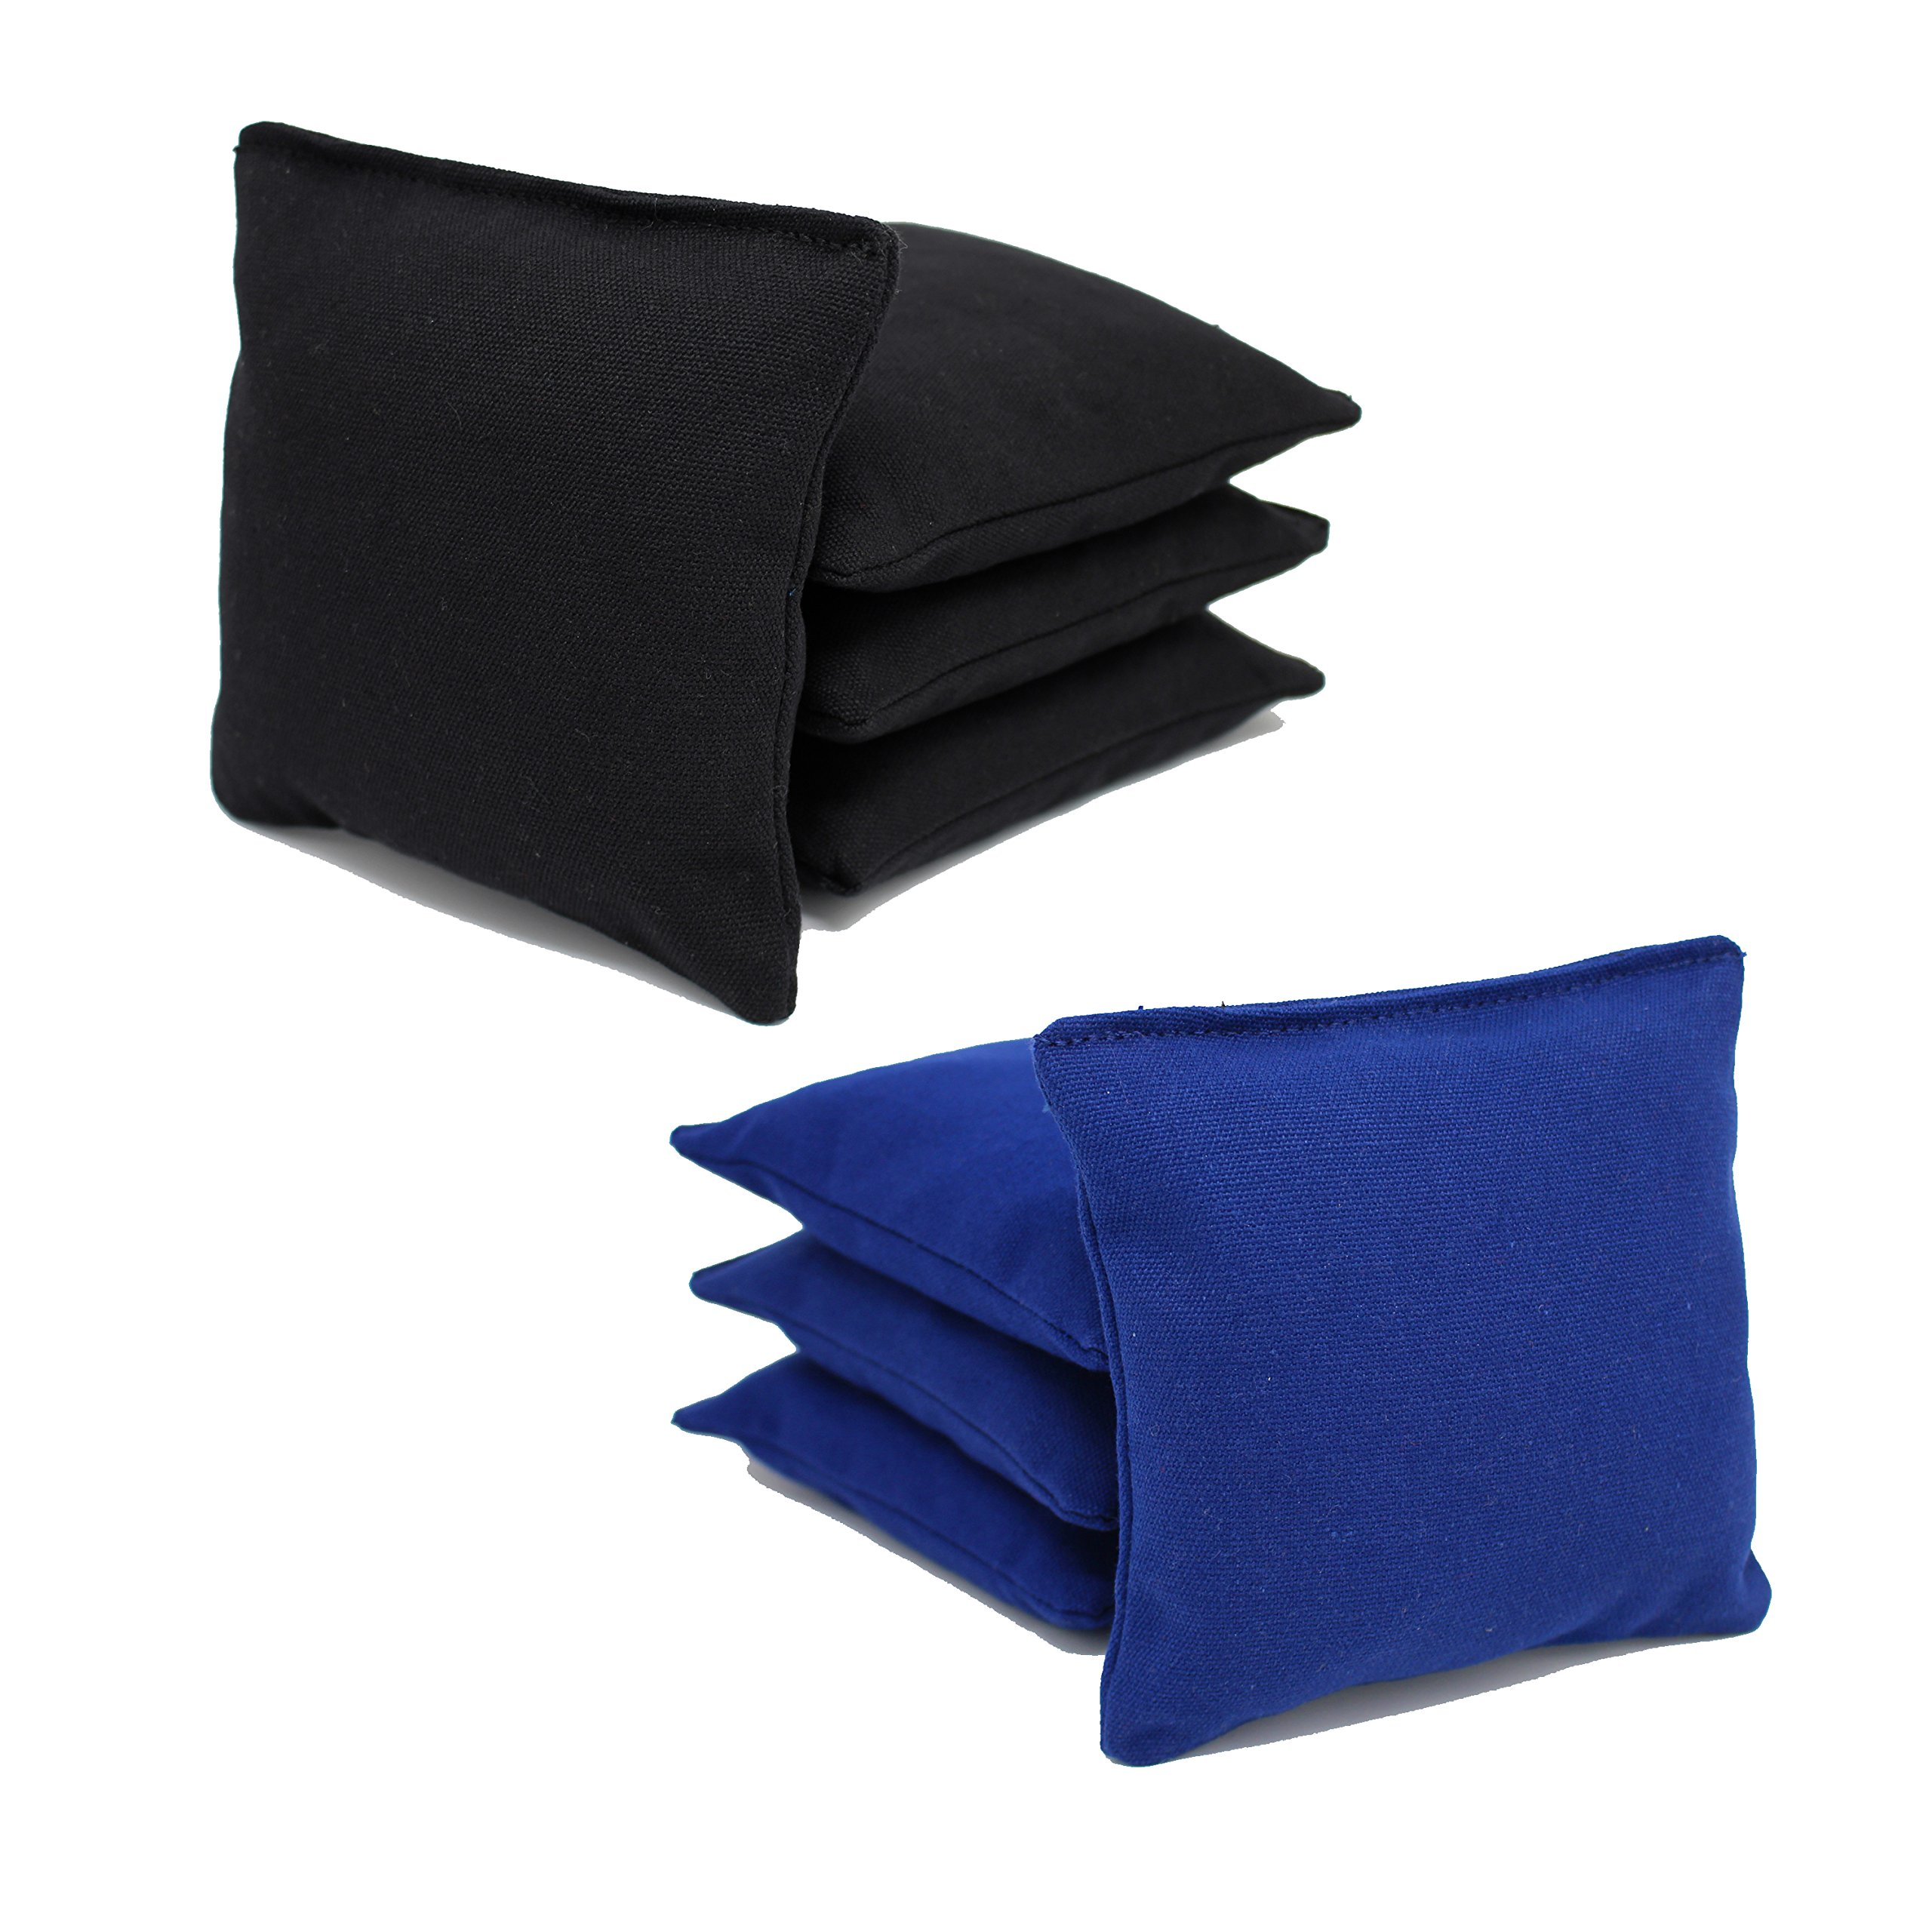 Free Donkey Sports Cornhole Bags (Pack of 8), Royal Blue/Black, Regular by Free Donkey Sports